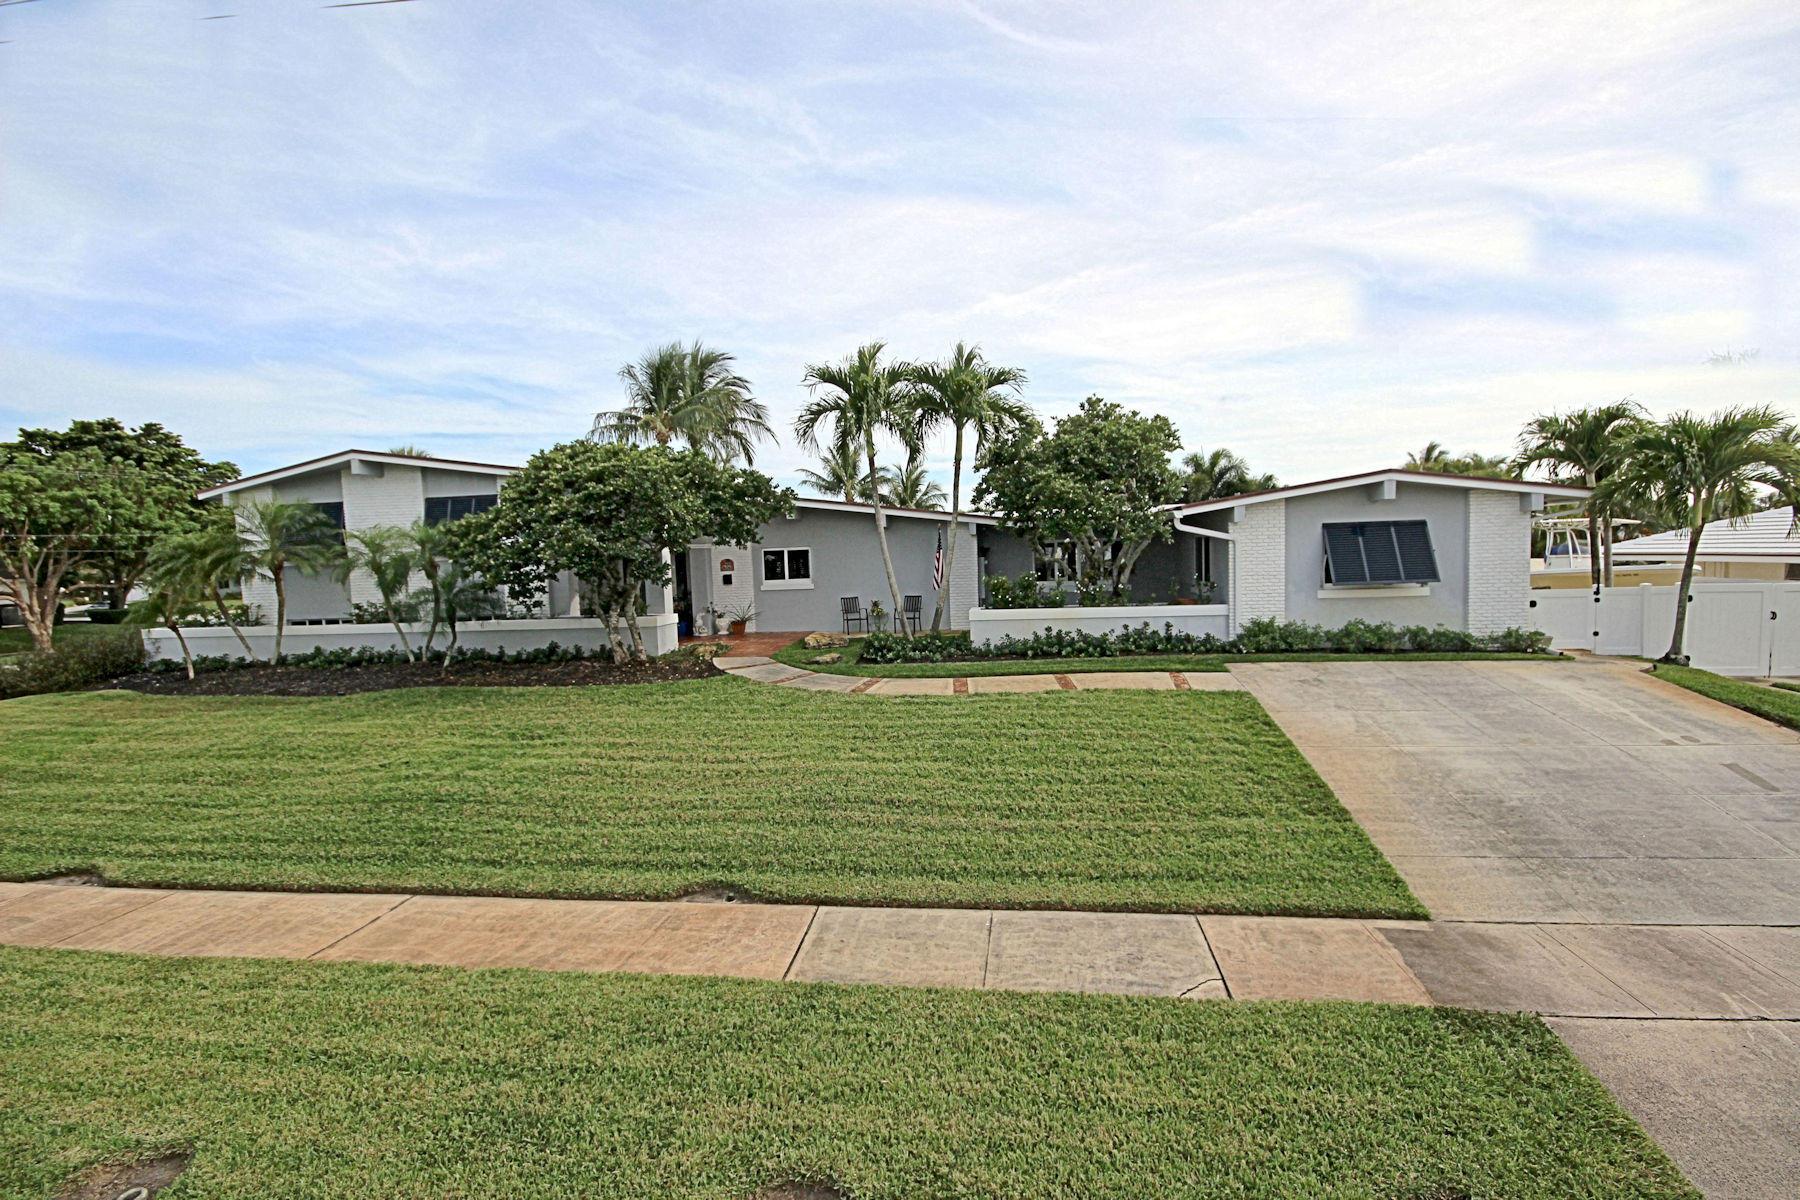 606 Riverside Road, North Palm Beach, Florida 33408, 5 Bedrooms Bedrooms, ,3.1 BathroomsBathrooms,A,Single family,Riverside,RX-10521089